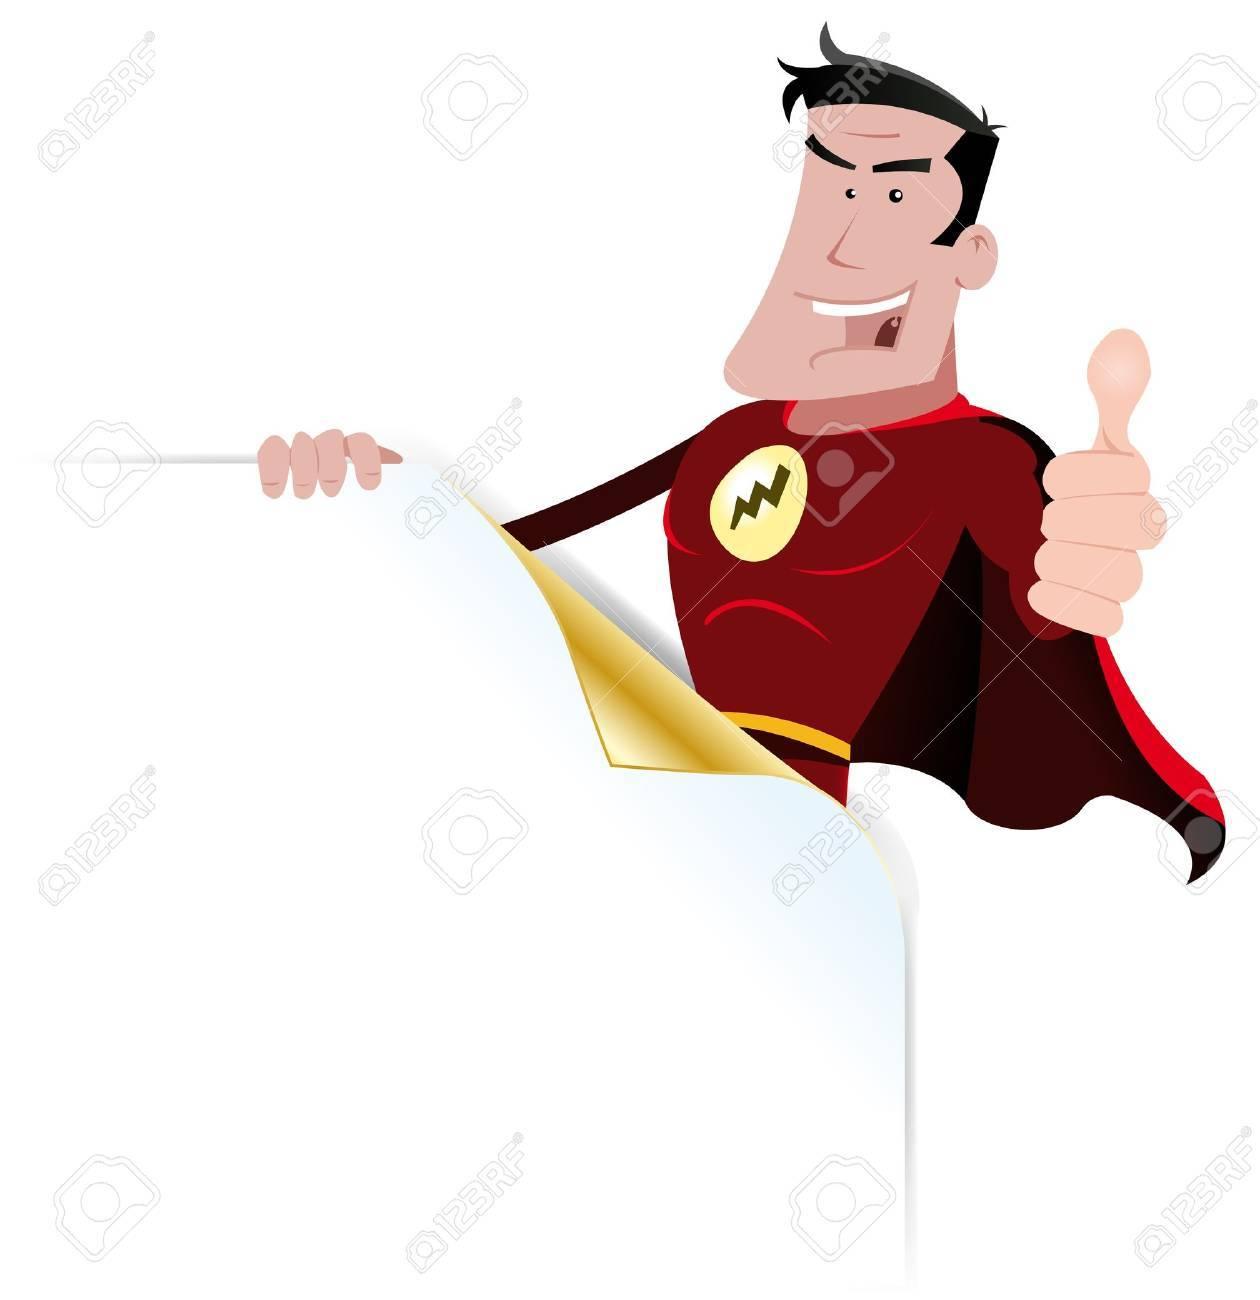 Illustration Of A Cartoon  Hero Sign Stock Vector - 11249002